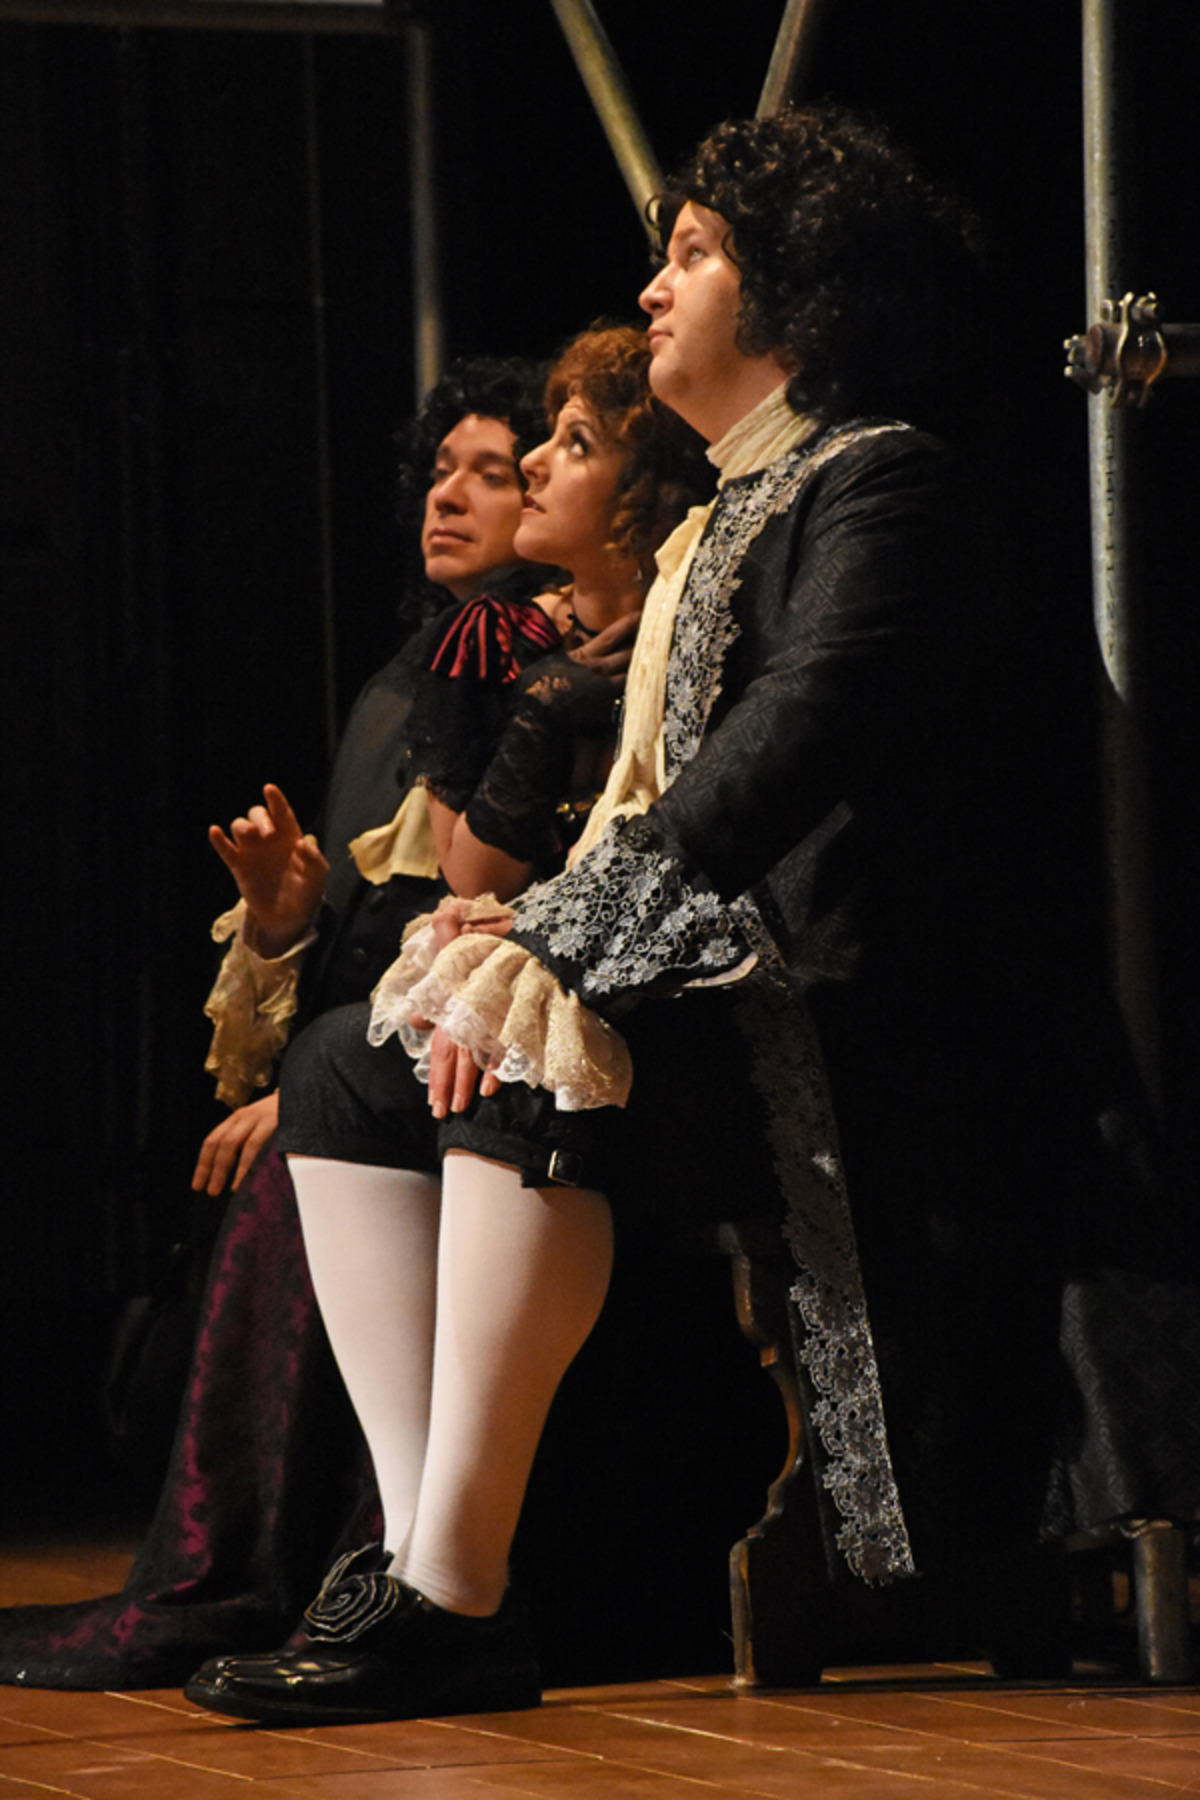 Charles II (N. Simpson), Nell Gwynn (S. Apostolou), and Hyde (D. Klein)